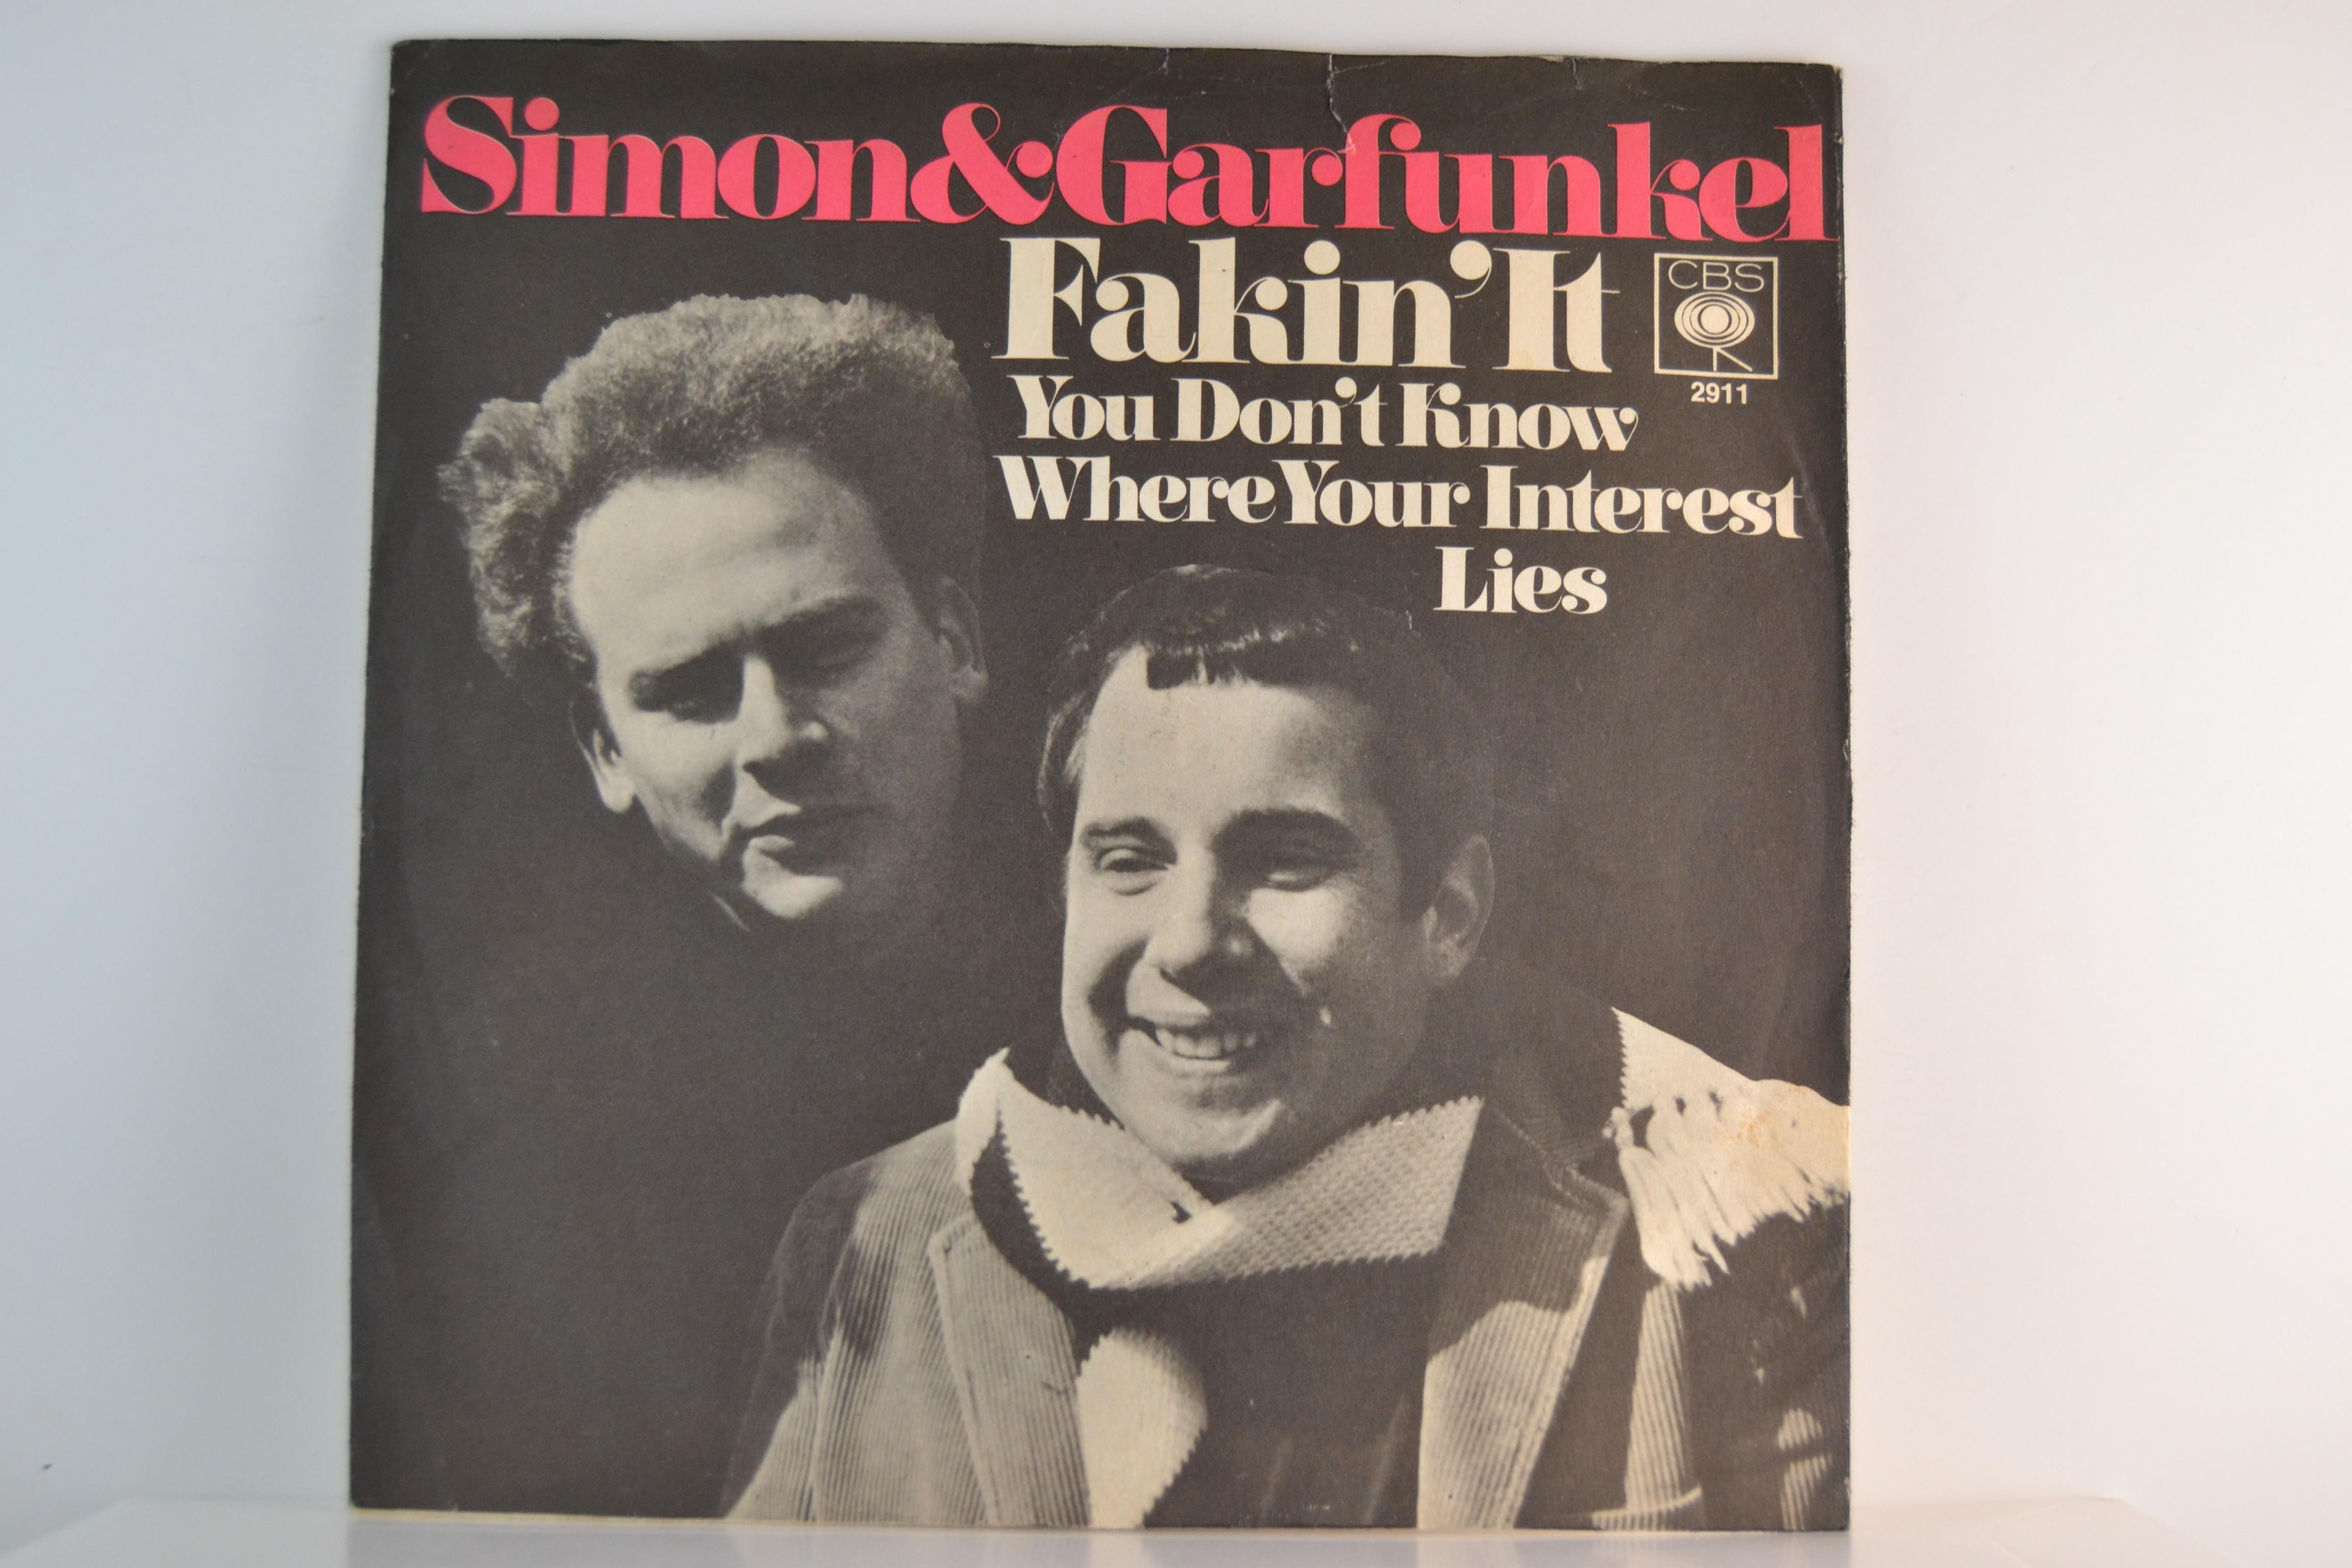 SIMON & GARFUNKEL : Fakin' it / You don't know where your interest lies